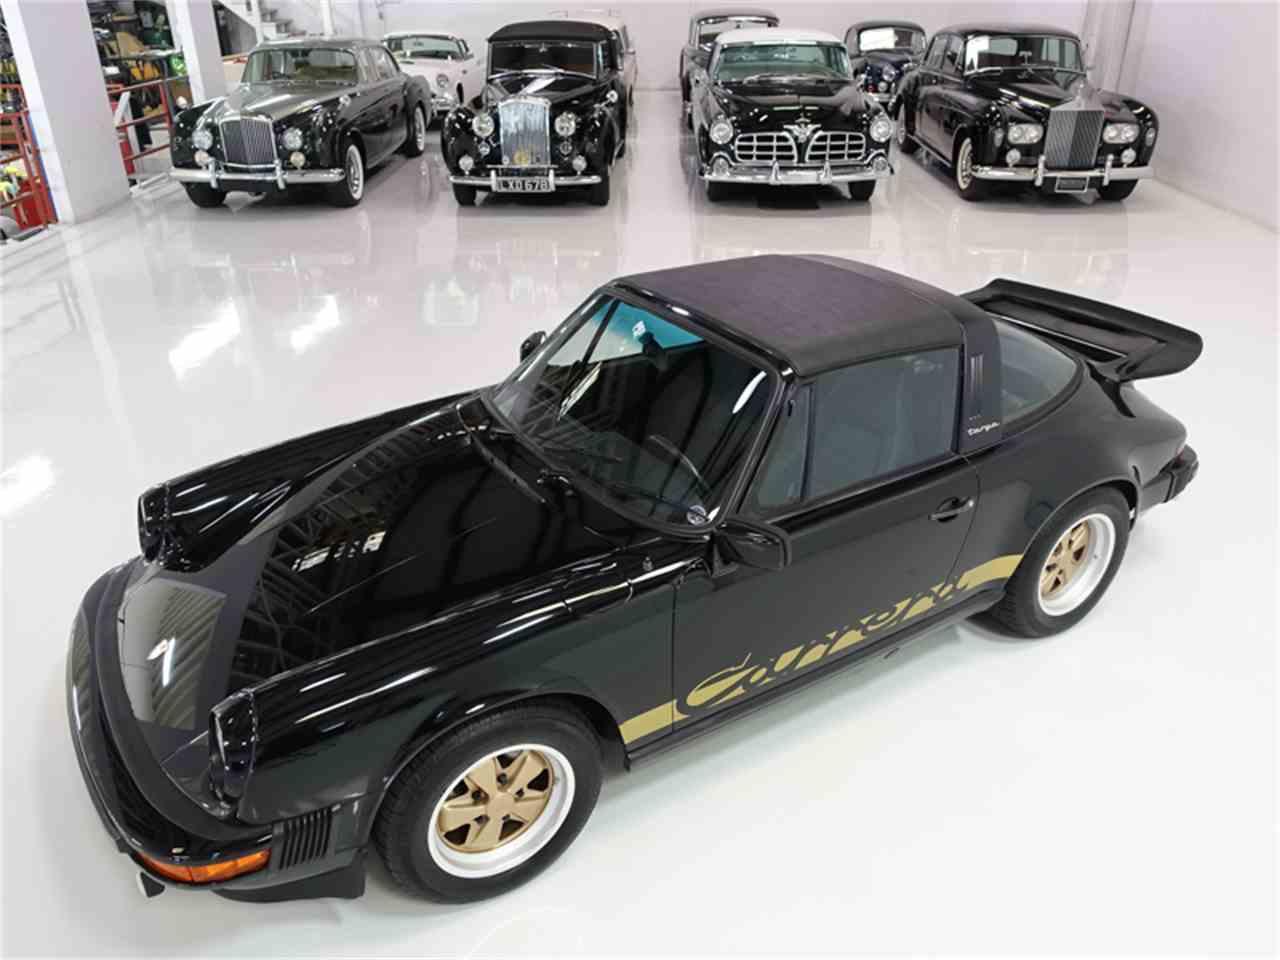 Large Picture of 1975 Porsche 911 Carrera located in Missouri - $89,900.00 Offered by Daniel Schmitt & Co. - KKFN